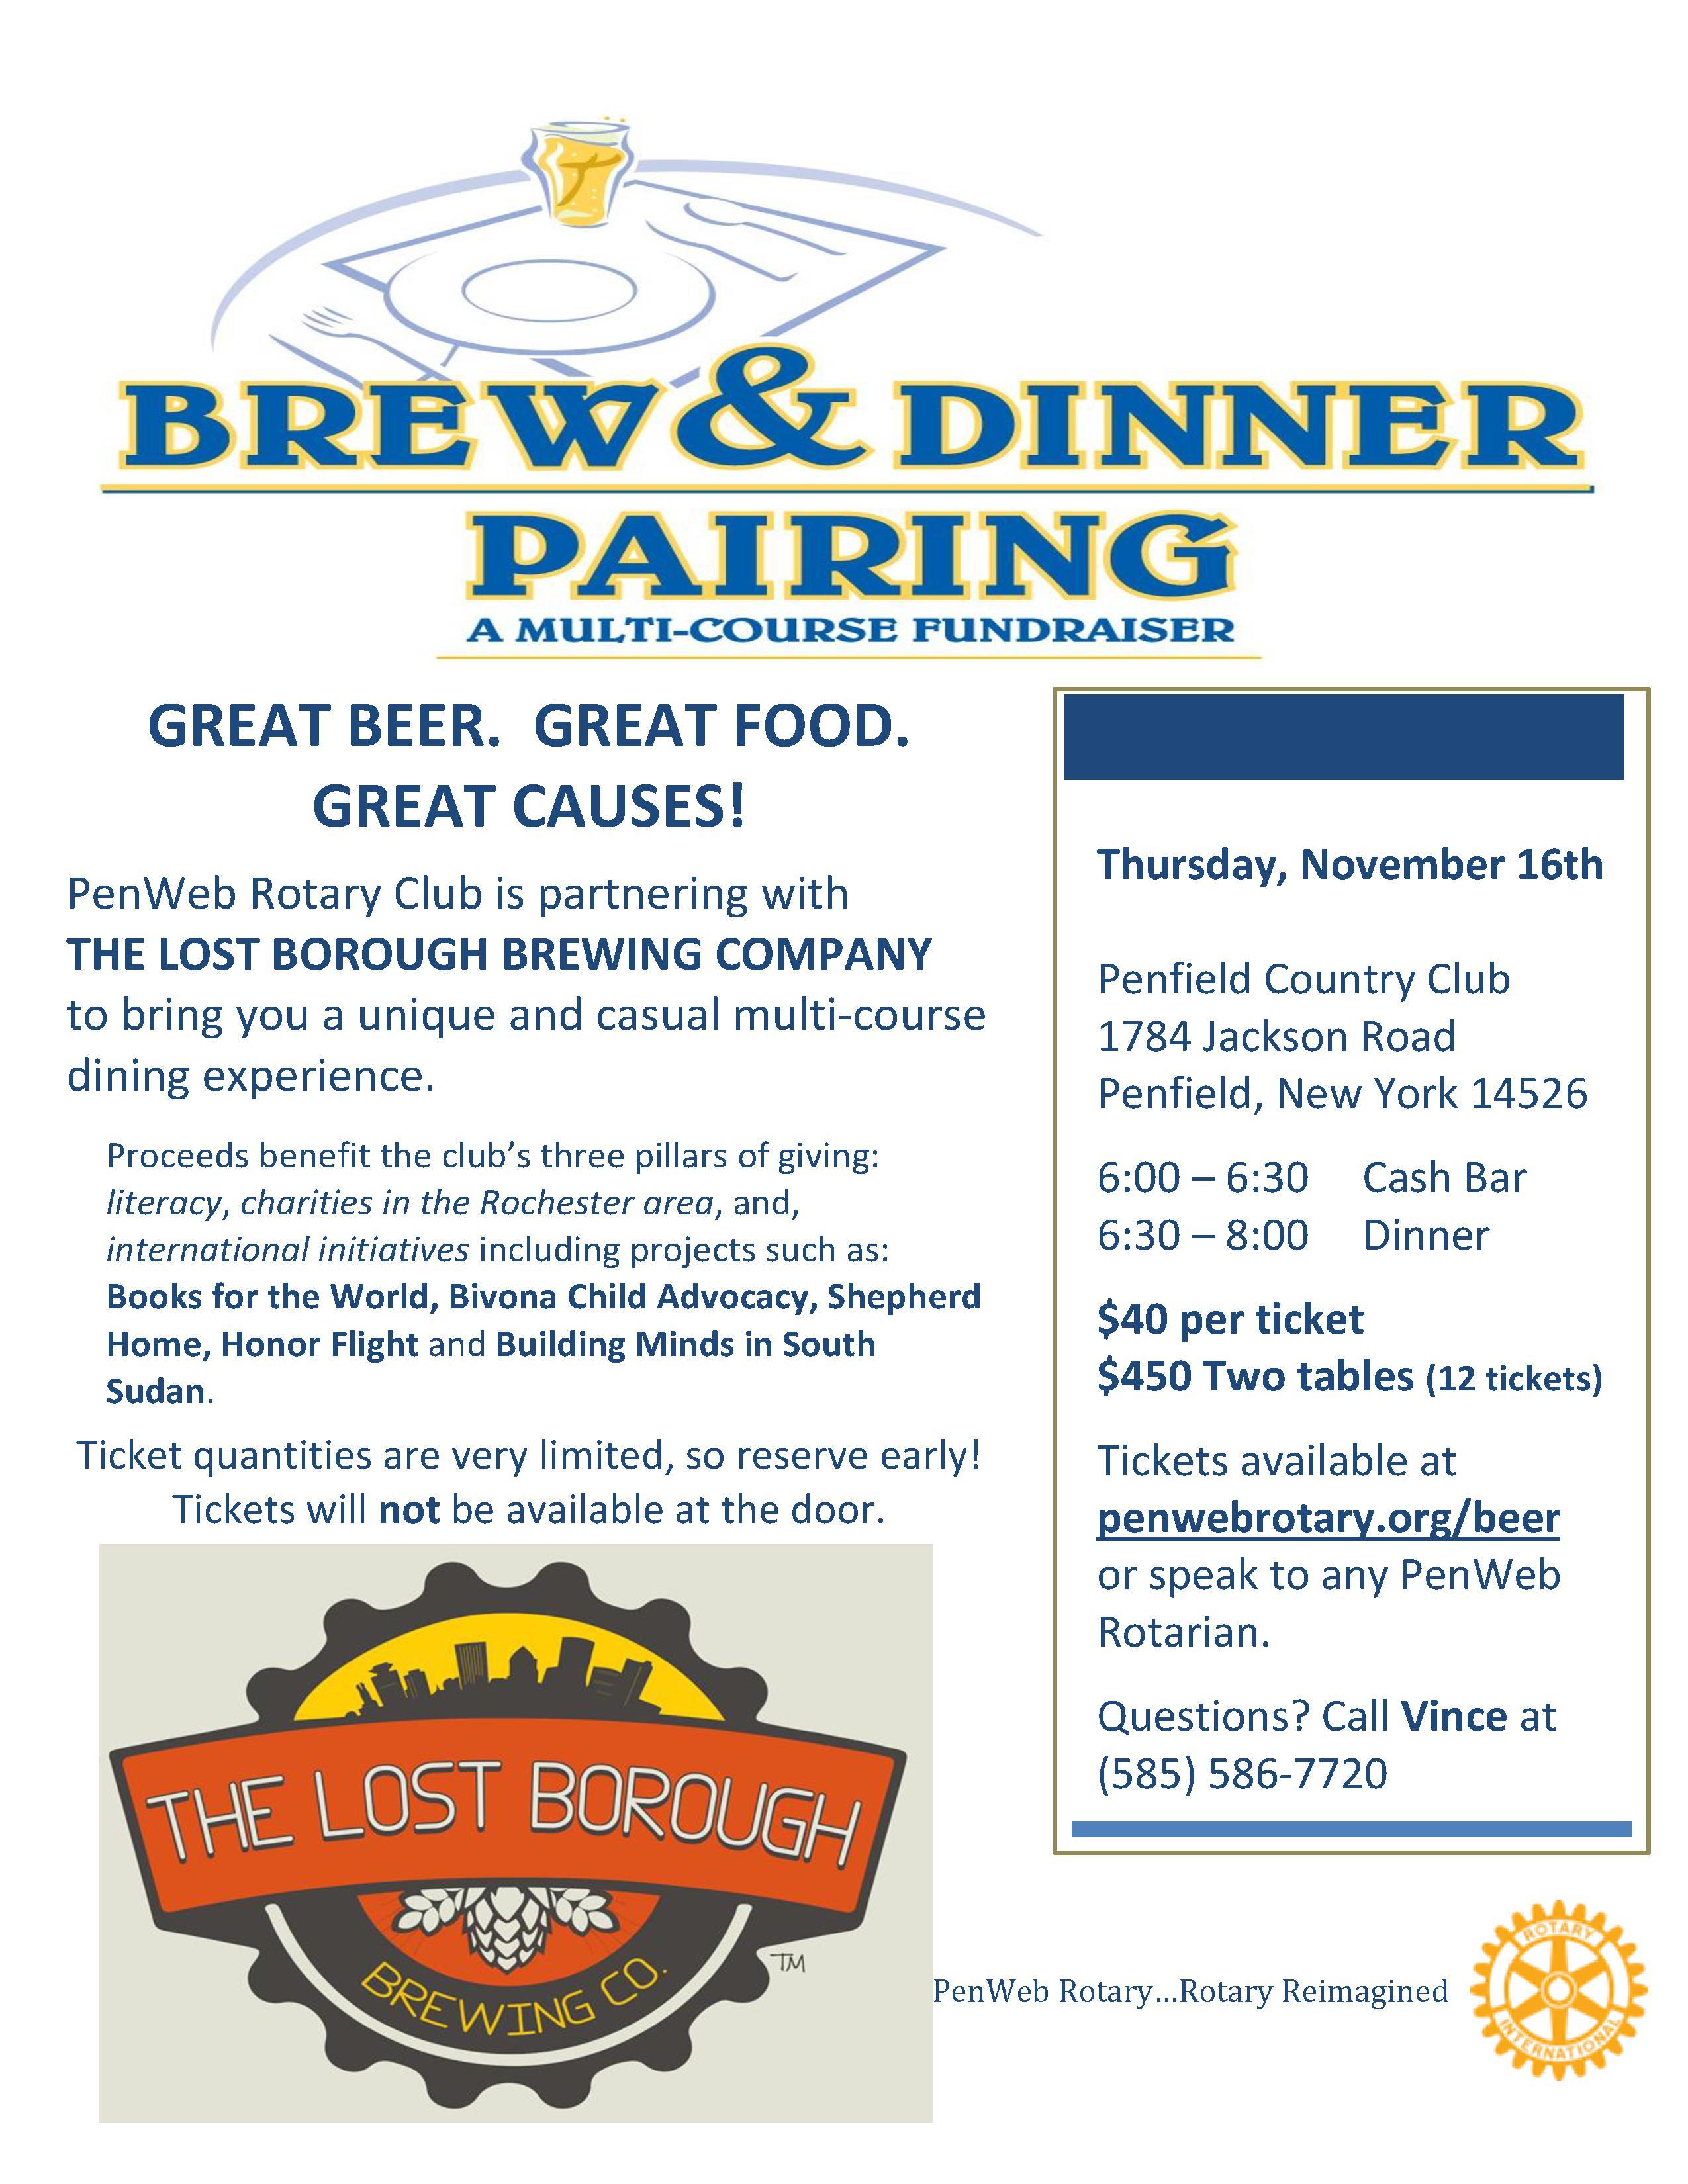 Brew & Dinner Flyer